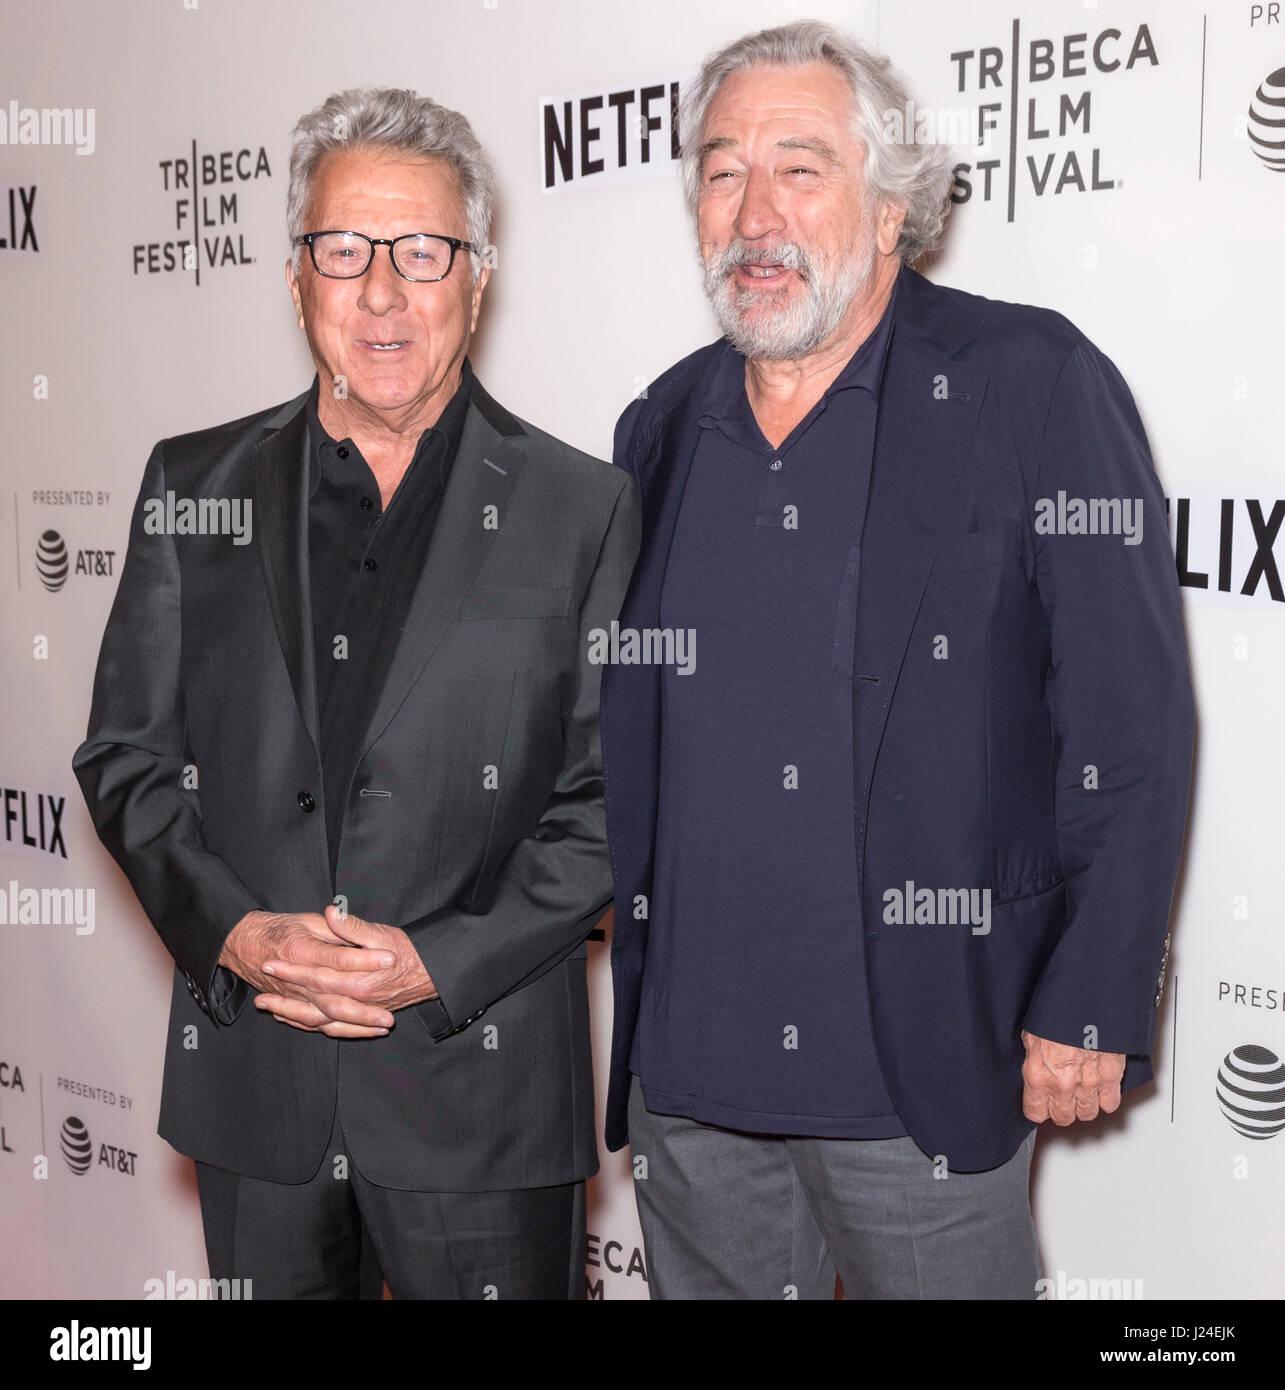 New York, USA. 24th April, 2017. Actors Dustin Hoffman and Robert De Niro attend Tribeca Talks Director's Series - Stock Image